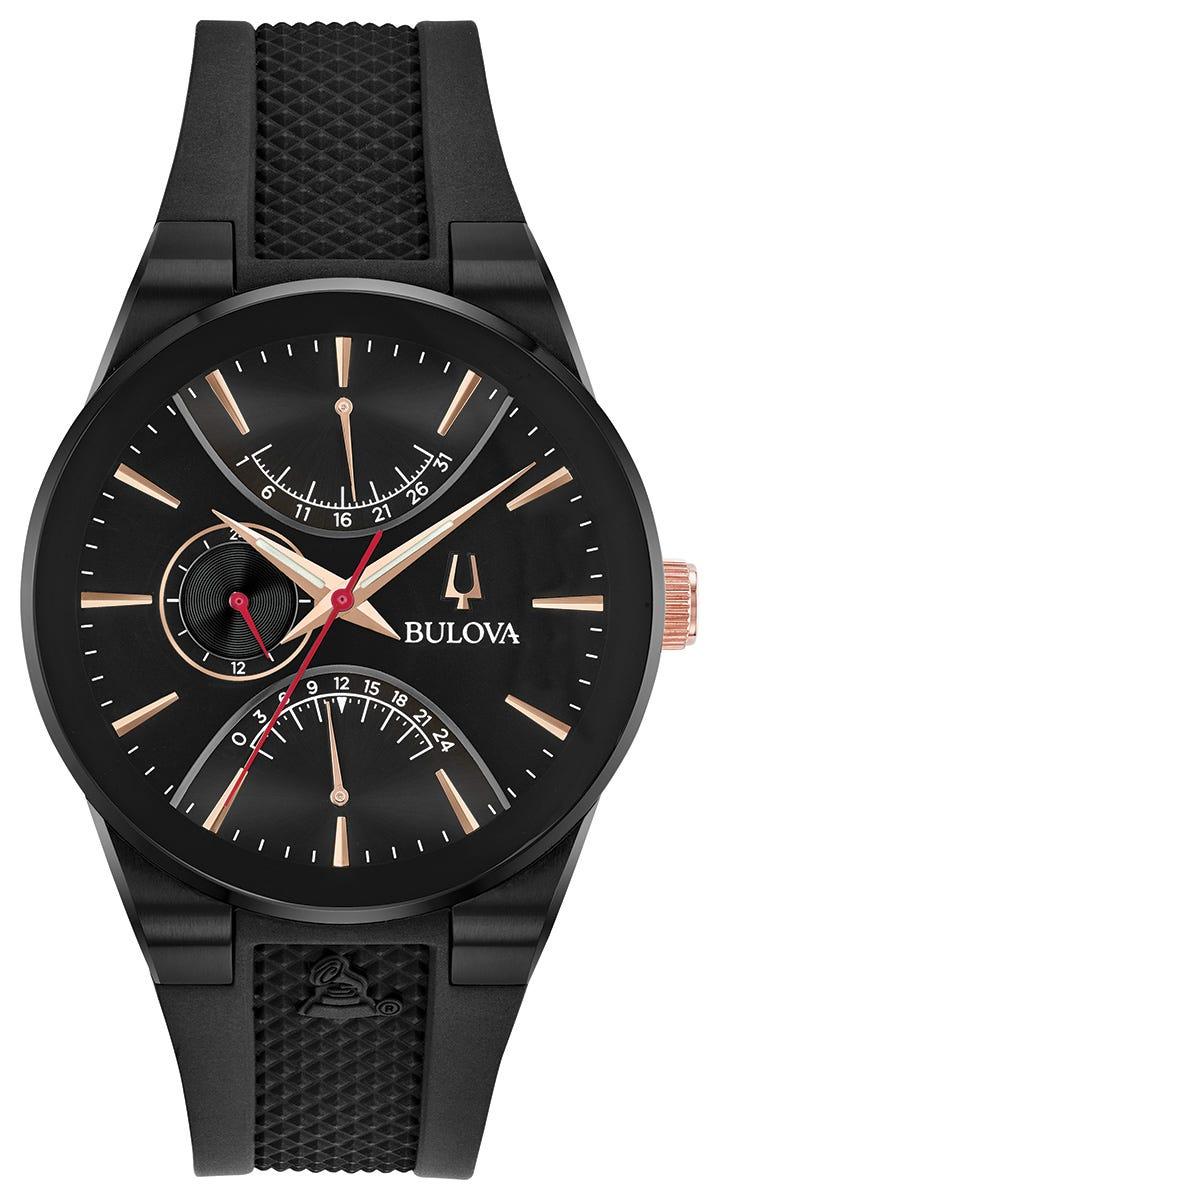 Bulova Grammy Edition Men's Chronograph Watch 98B321